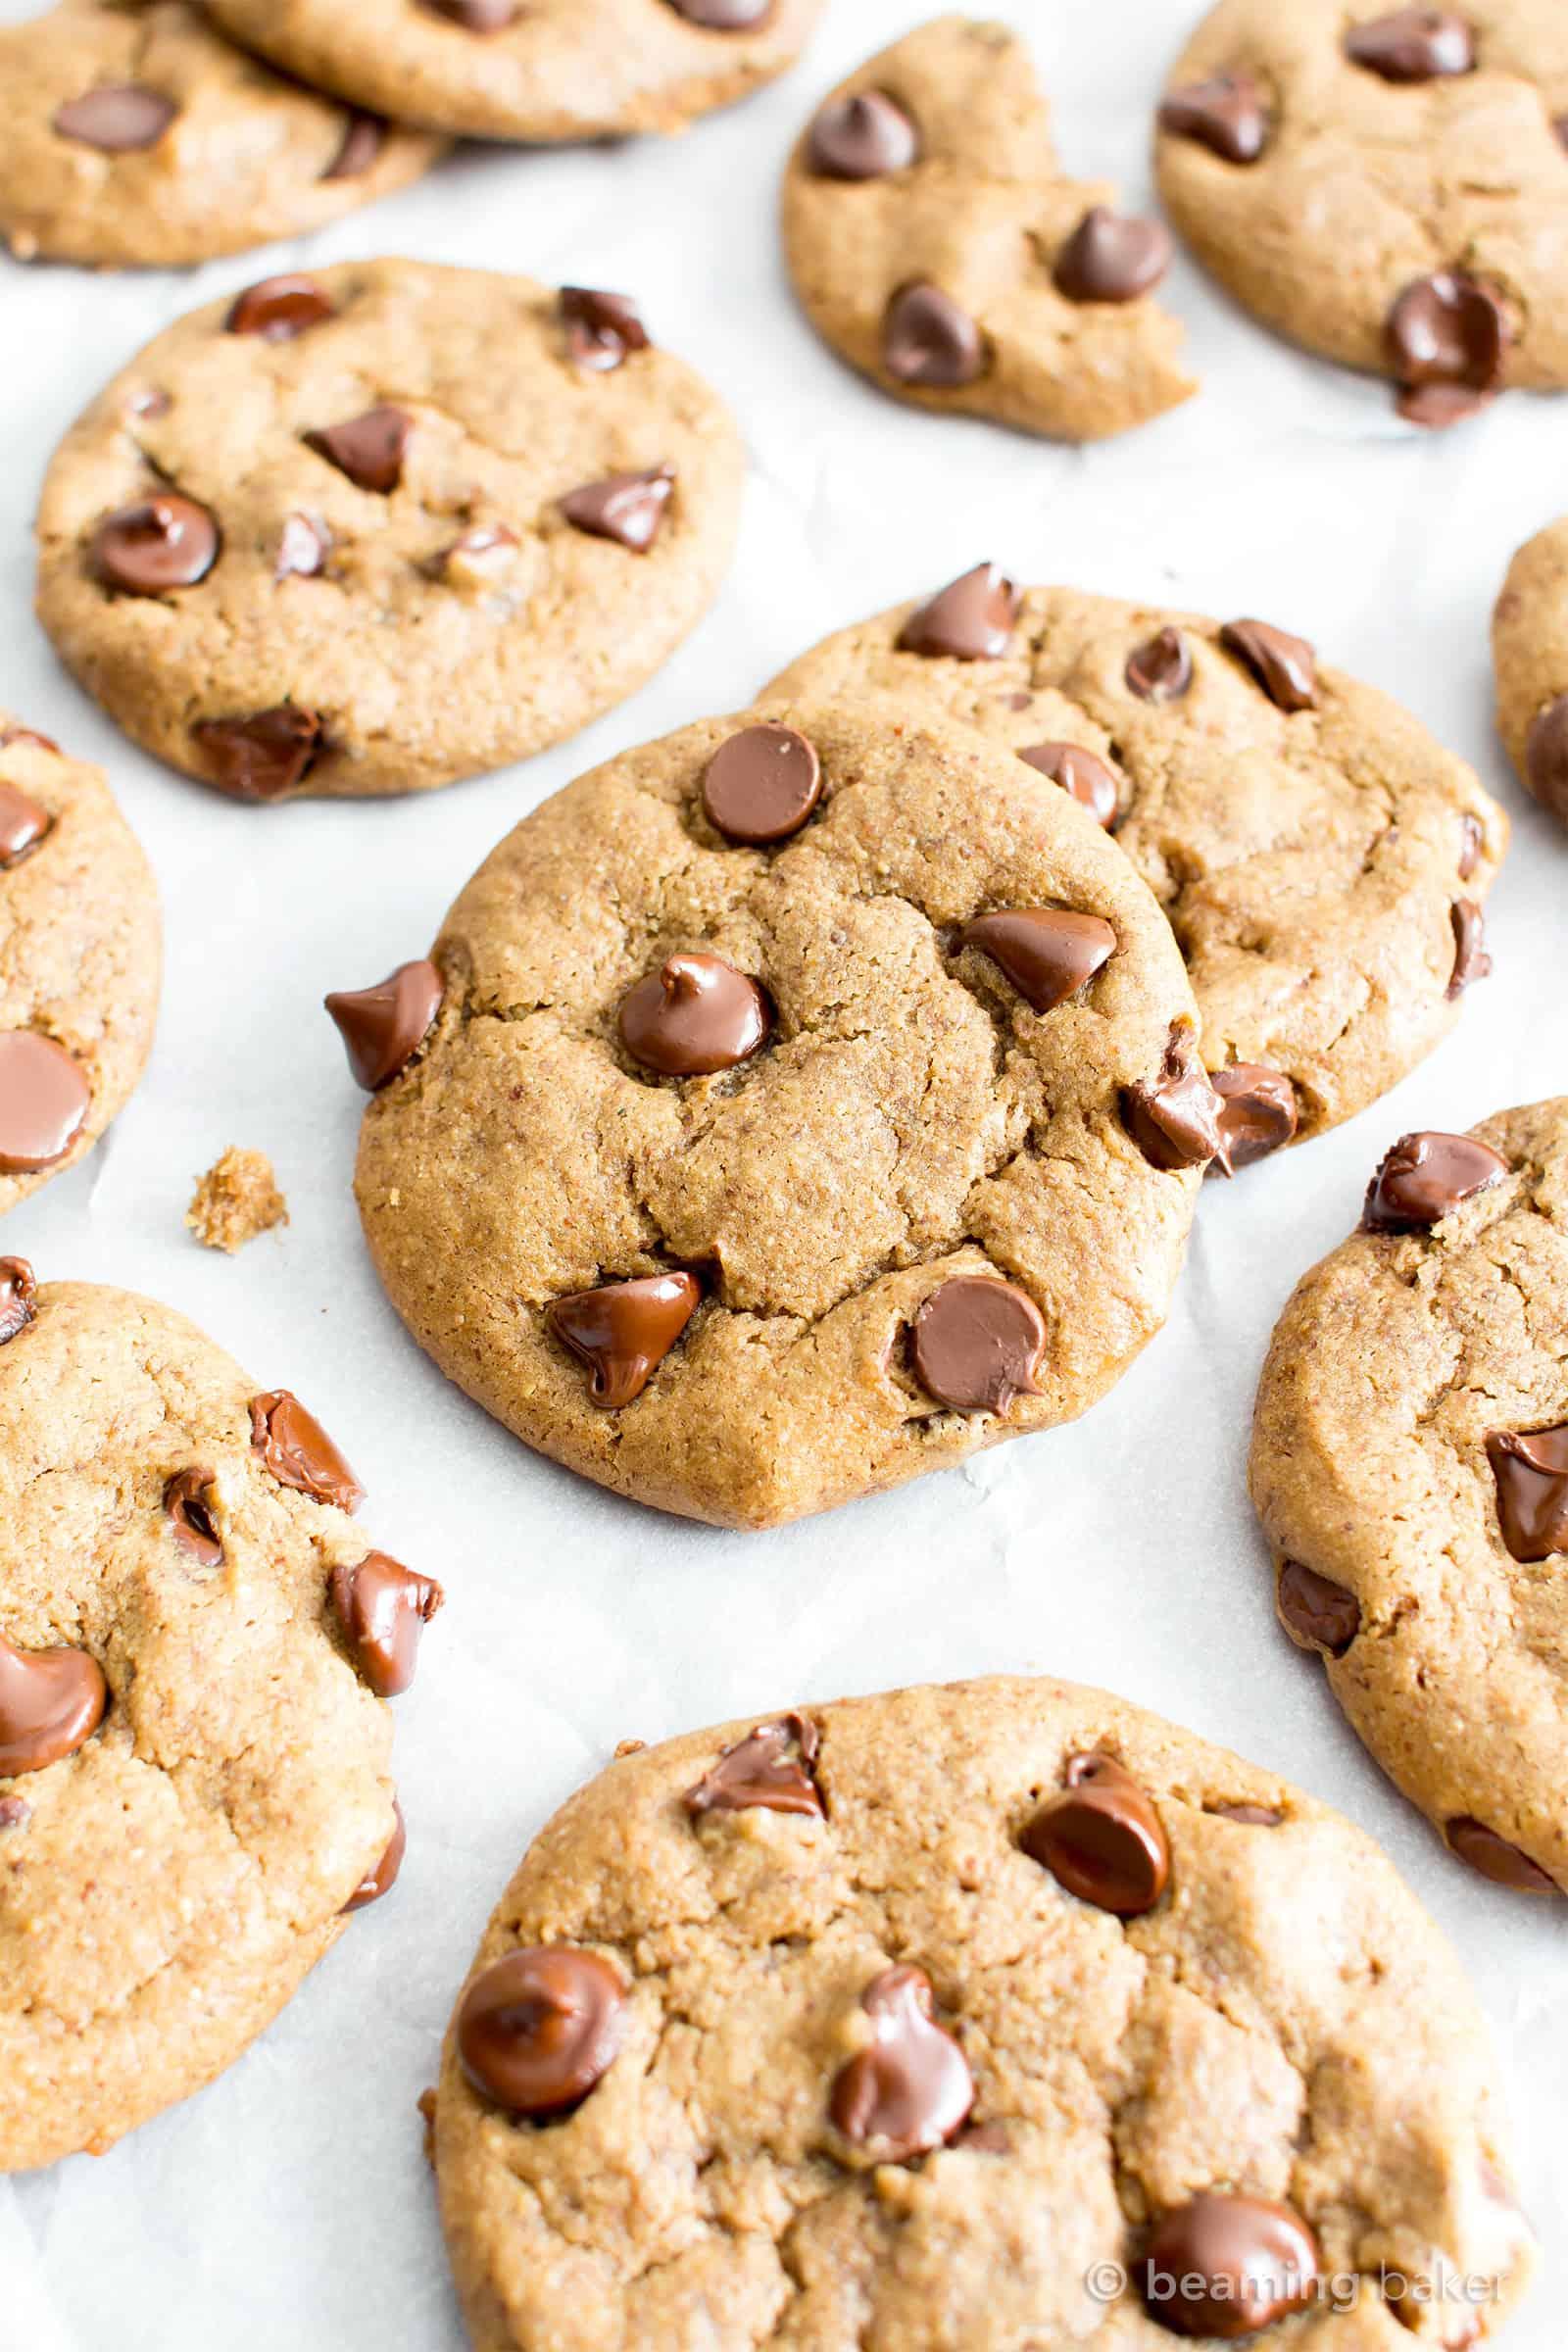 Gluten Free Almond Butter Chocolate Chip Cookies (Vegan ...